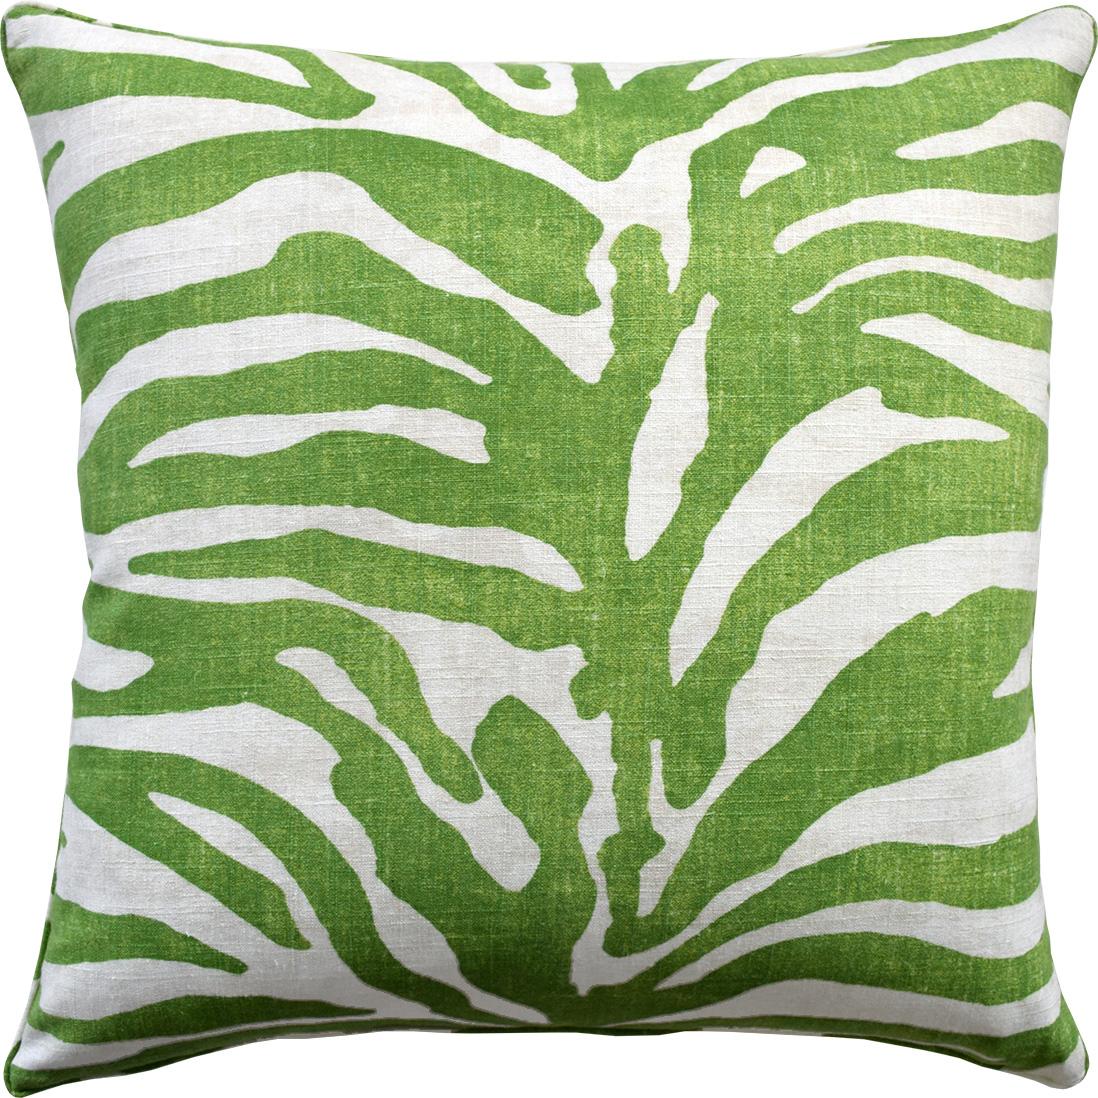 Serengeti Green Pillow